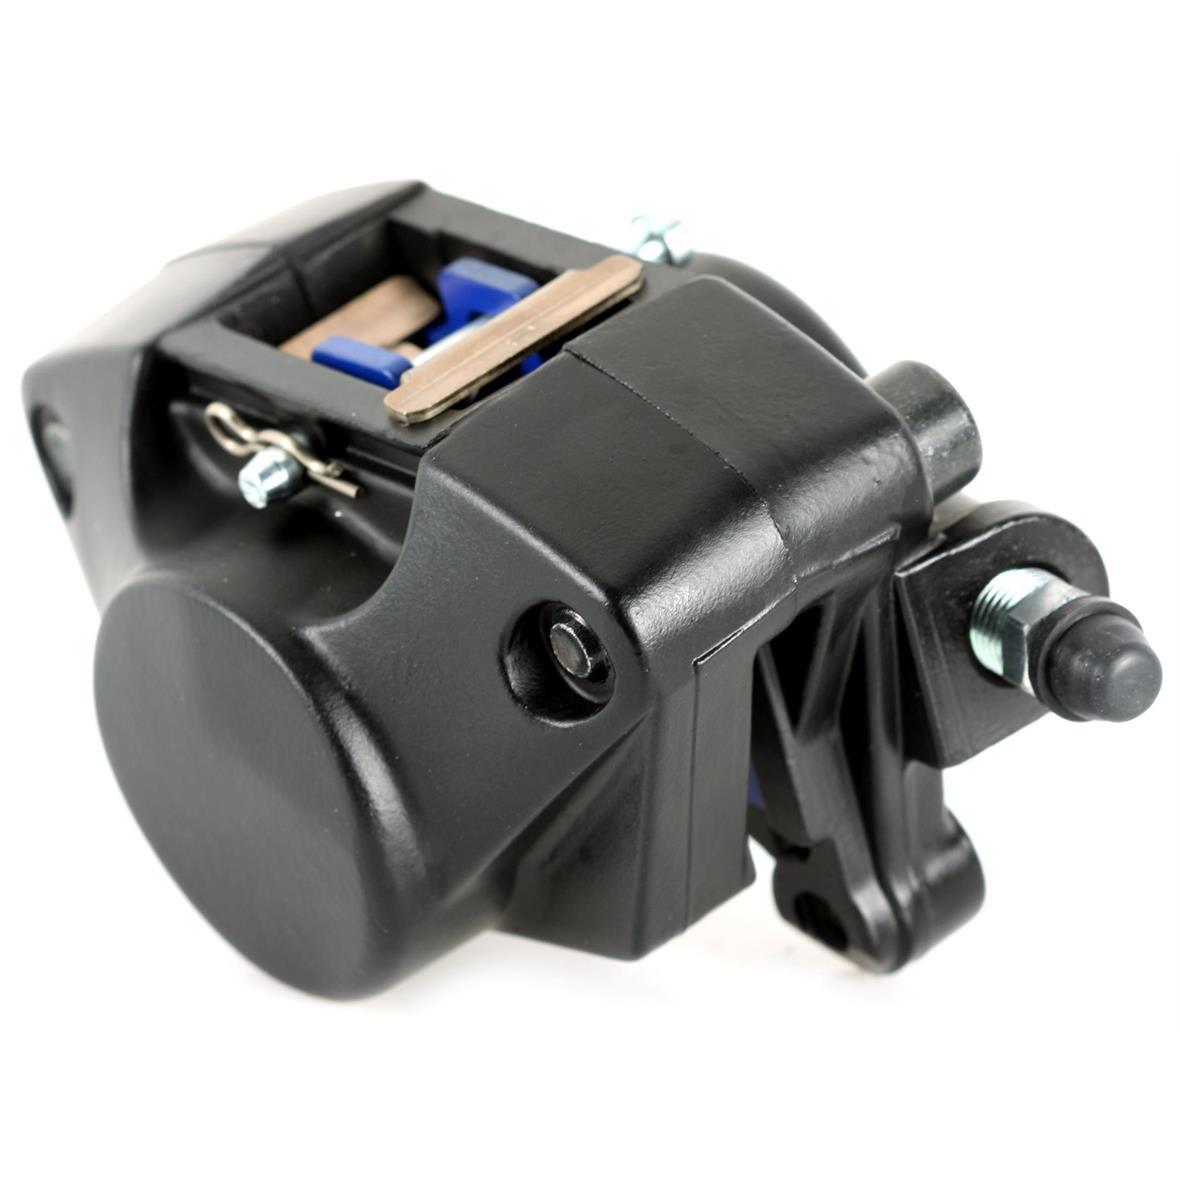 Product Image for 'Brake Calliper PIAGGIO HENGTONG, rearTitle'